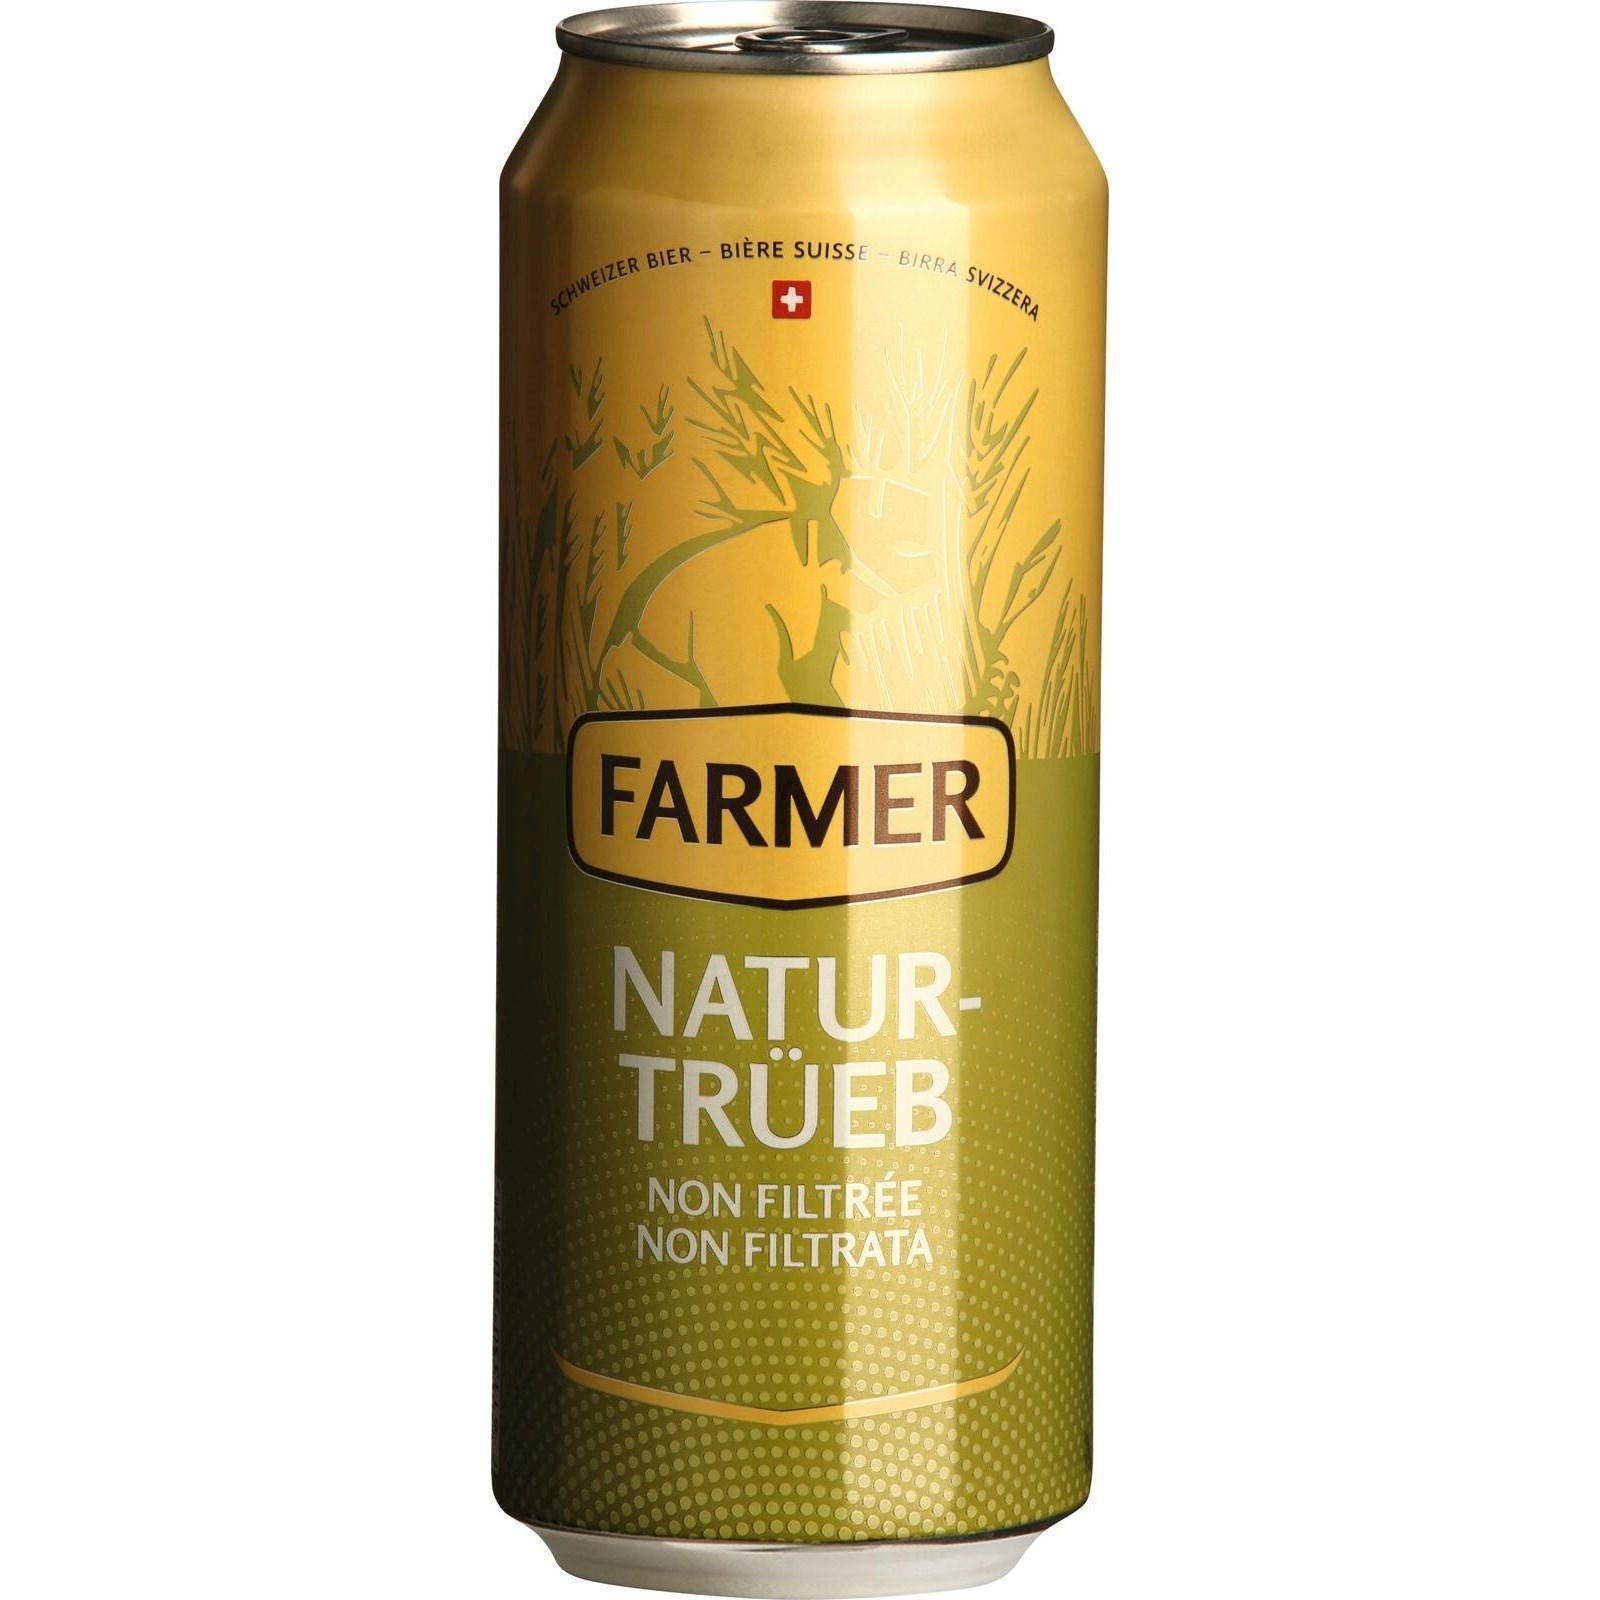 bier farmer naturtr b 50 cl biere mit alkohol landi. Black Bedroom Furniture Sets. Home Design Ideas